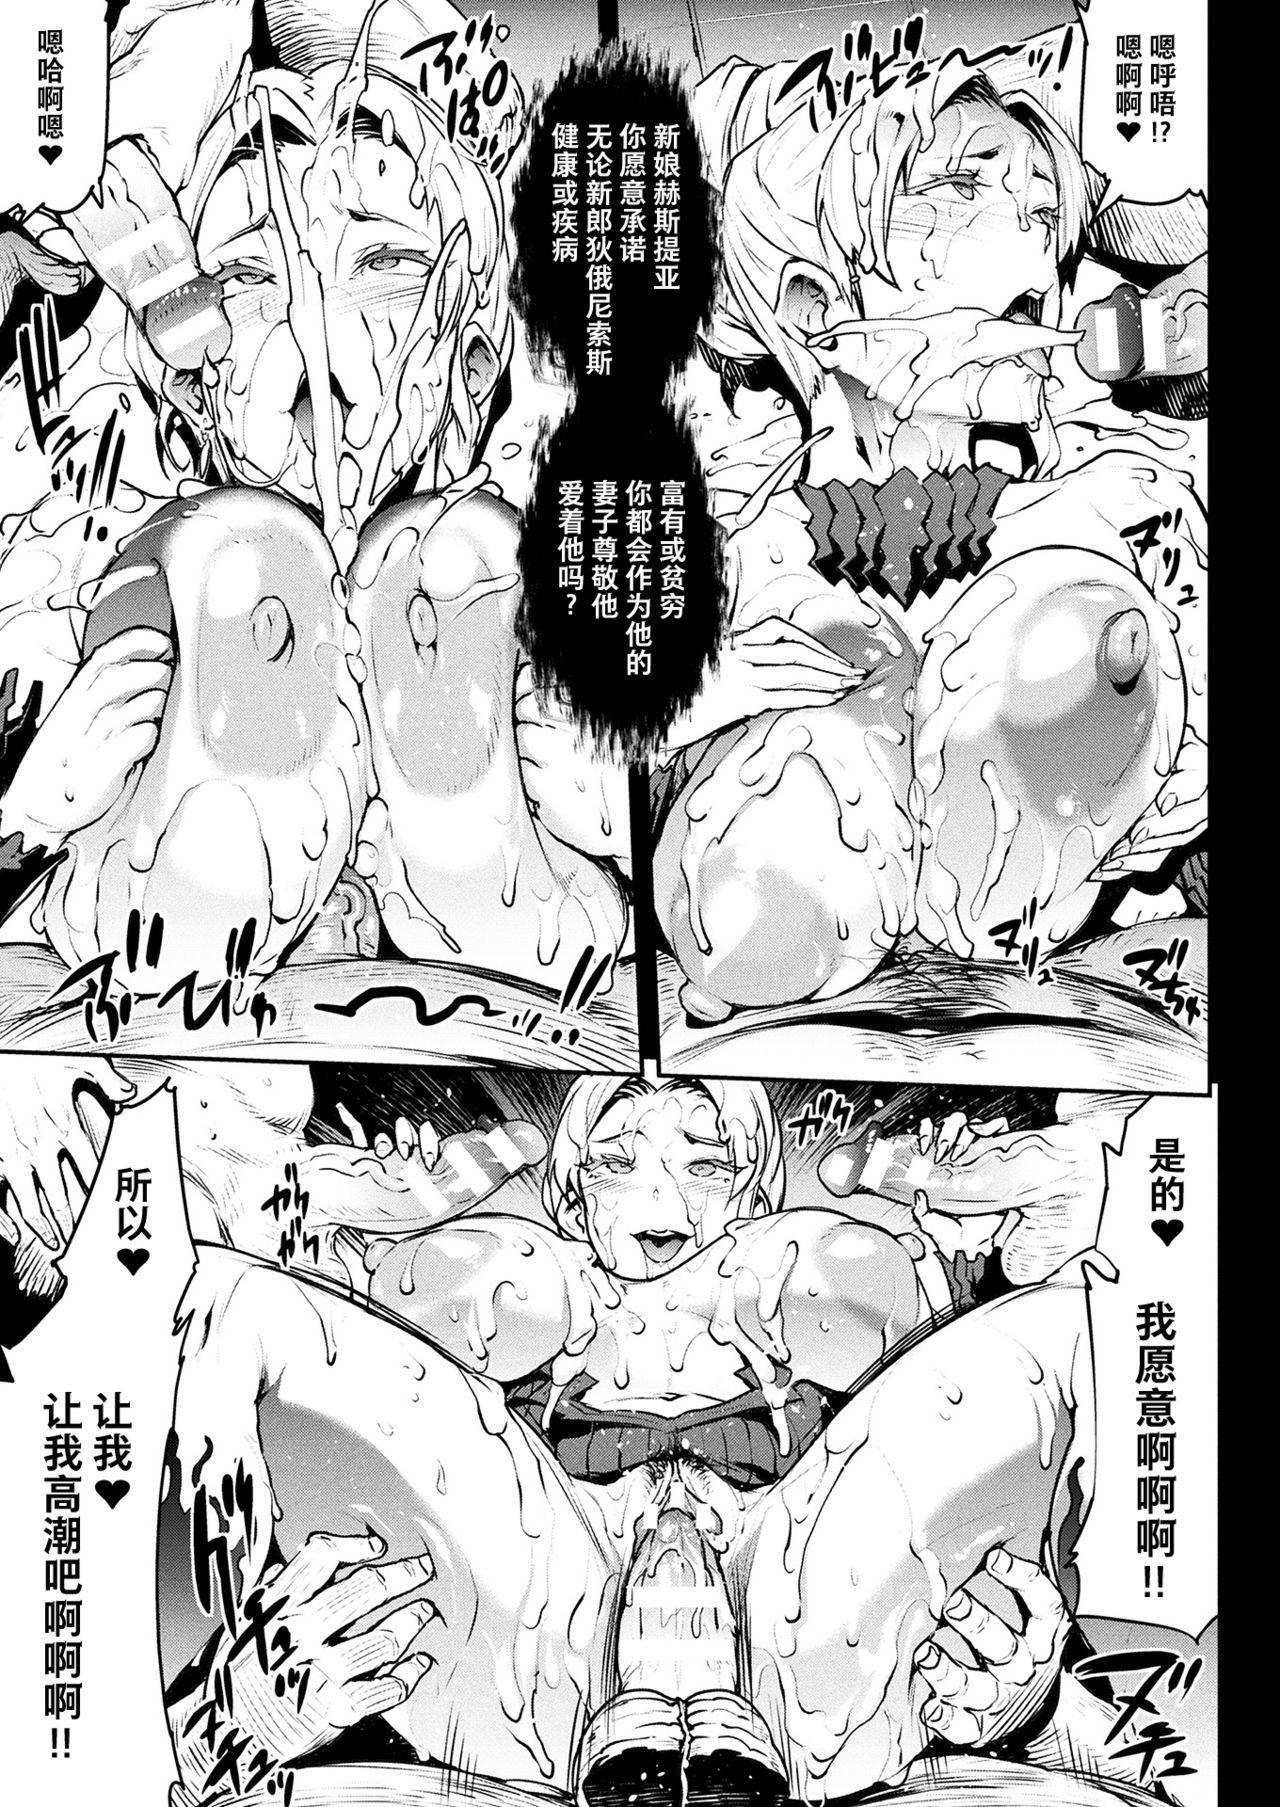 [Erect Sawaru] Raikou Shinki Igis Magia -PANDRA saga 3rd ignition- Ch. 24 (COMIC Unreal 2020-08 Vol. 86) [Chinese] [不咕鸟汉化组] [Digital] 18